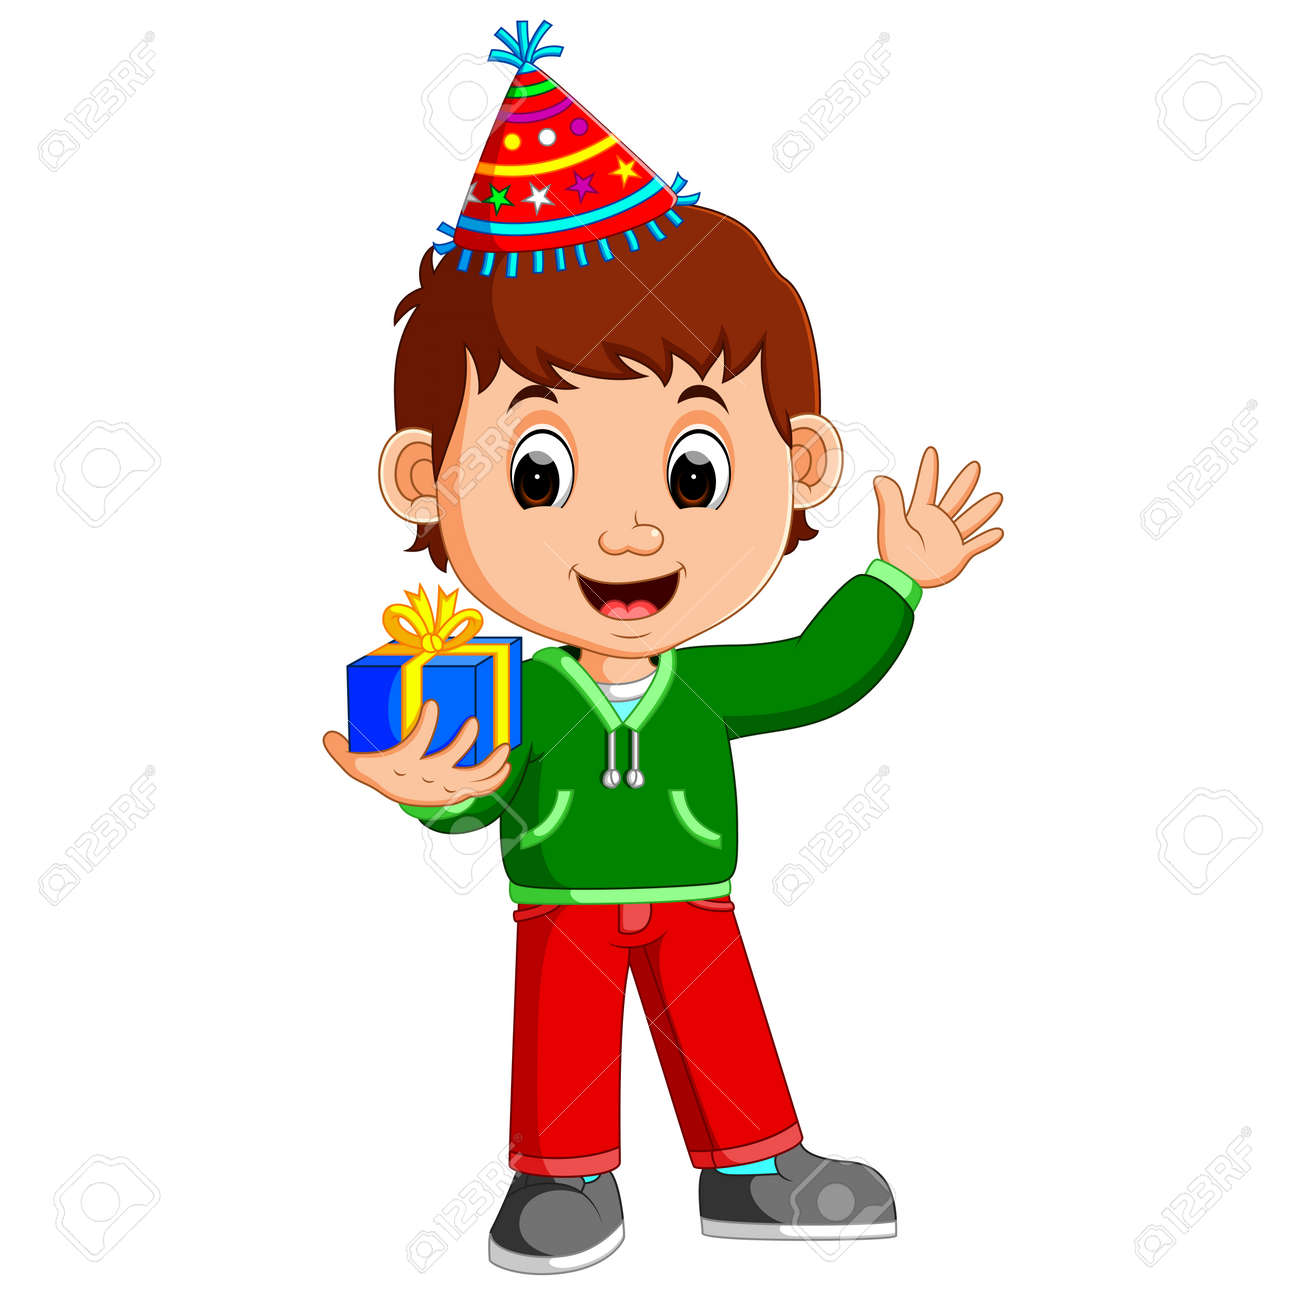 Boy Holding Birthday Gifts Stock Vector